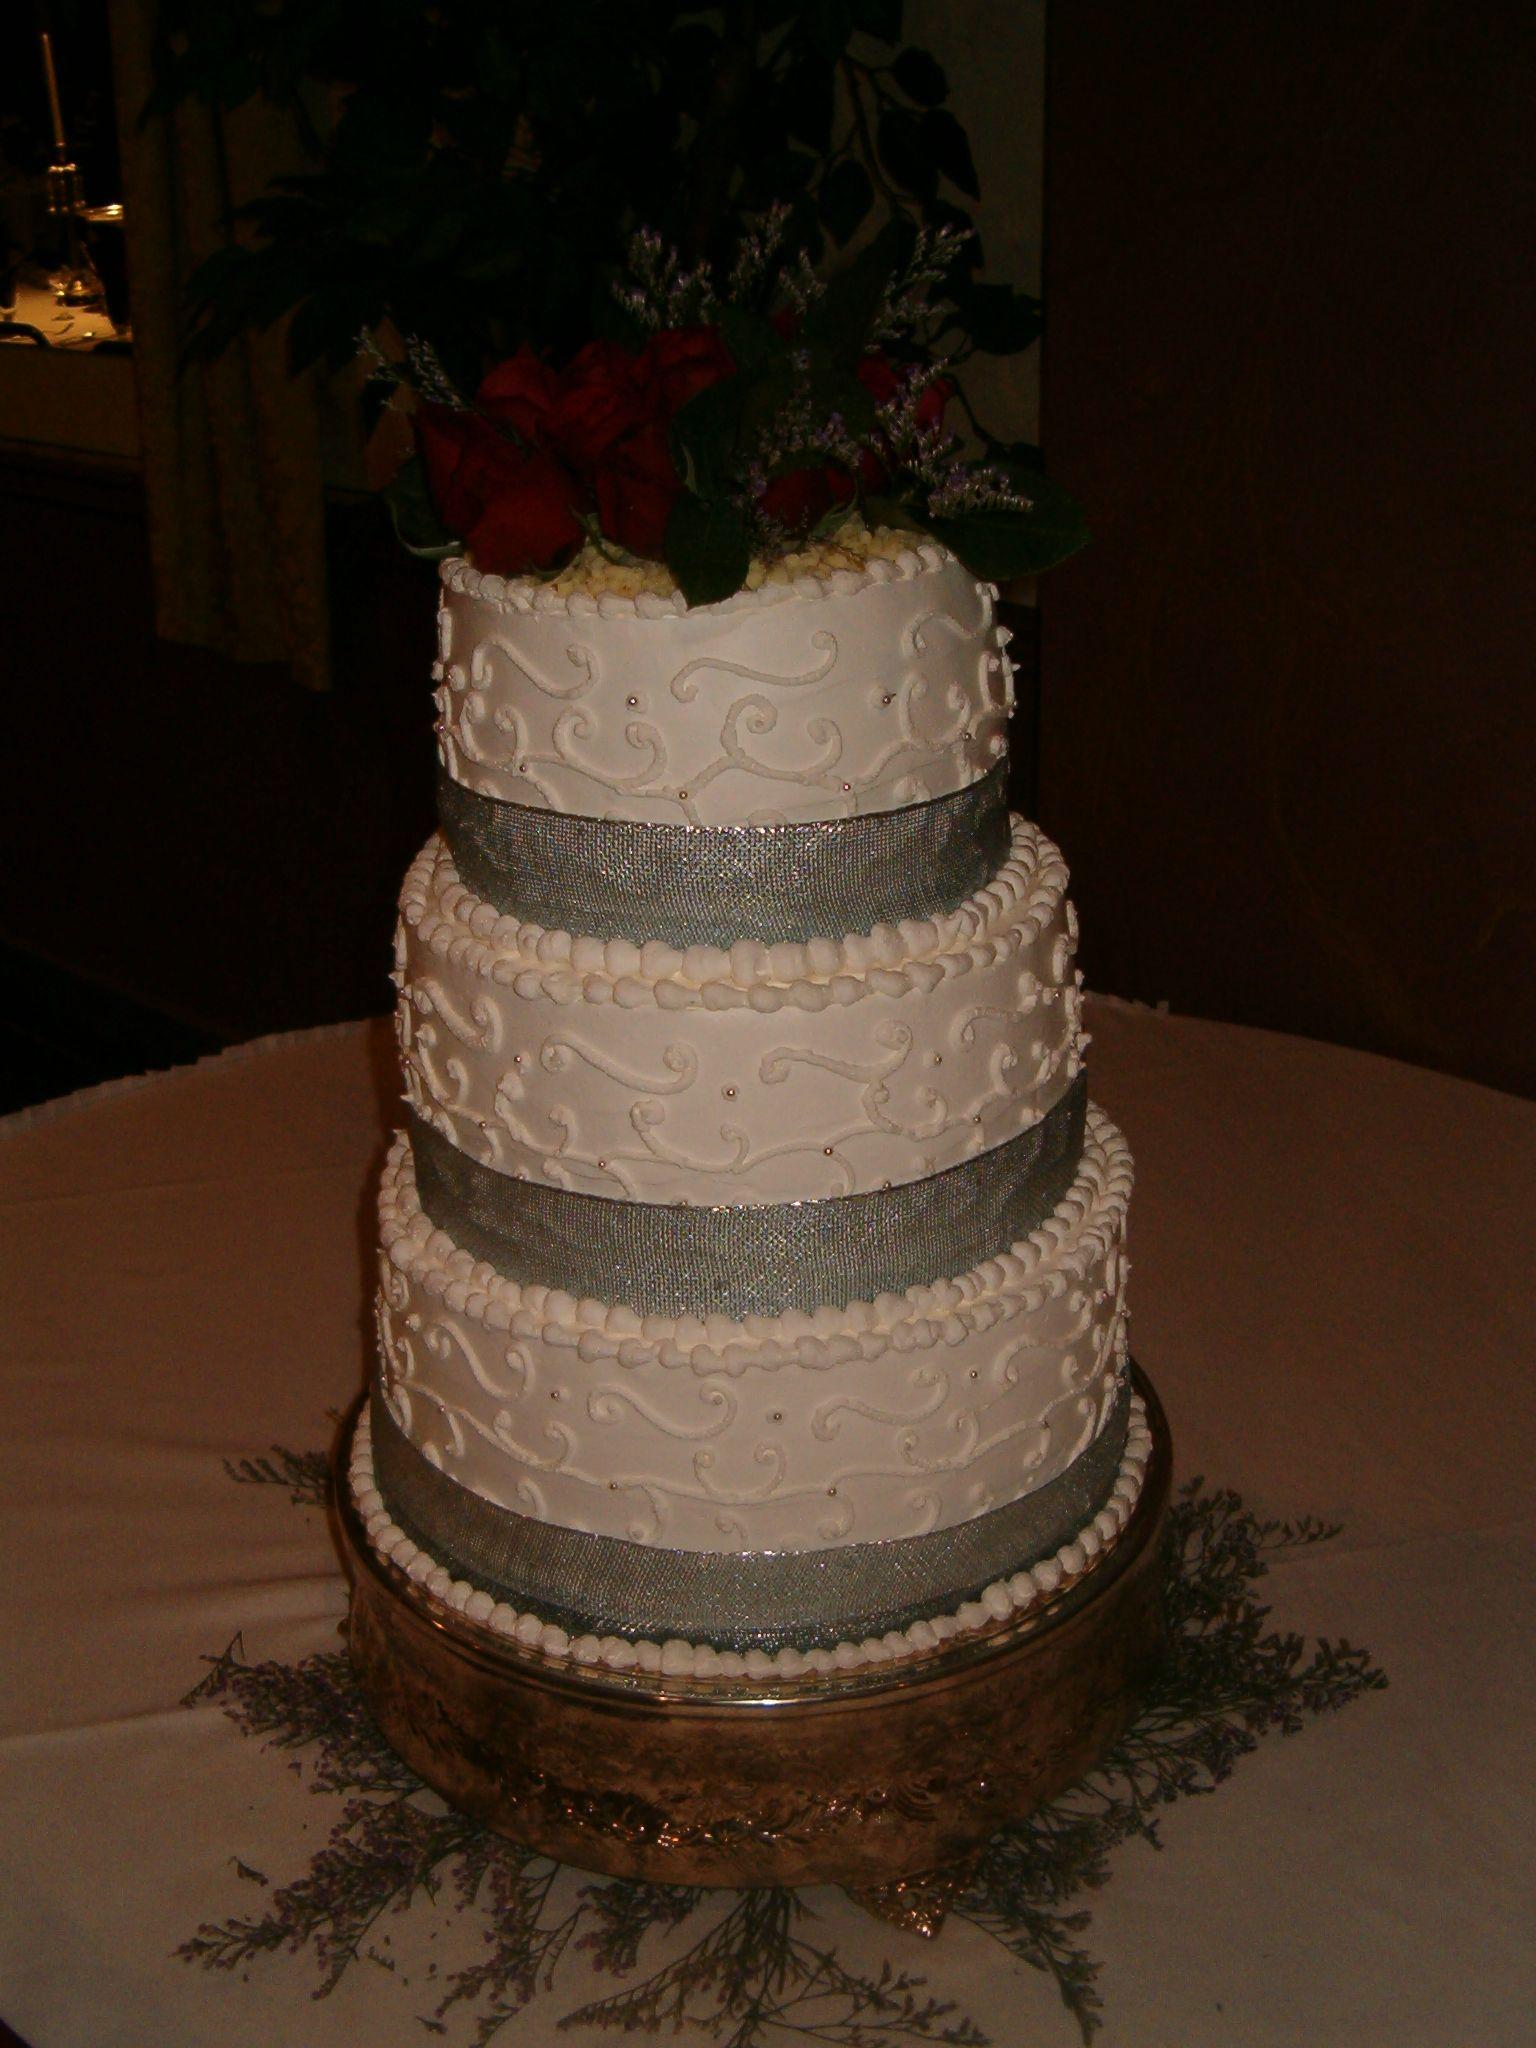 Burgundy White Silver Whipped Icing wedding cake